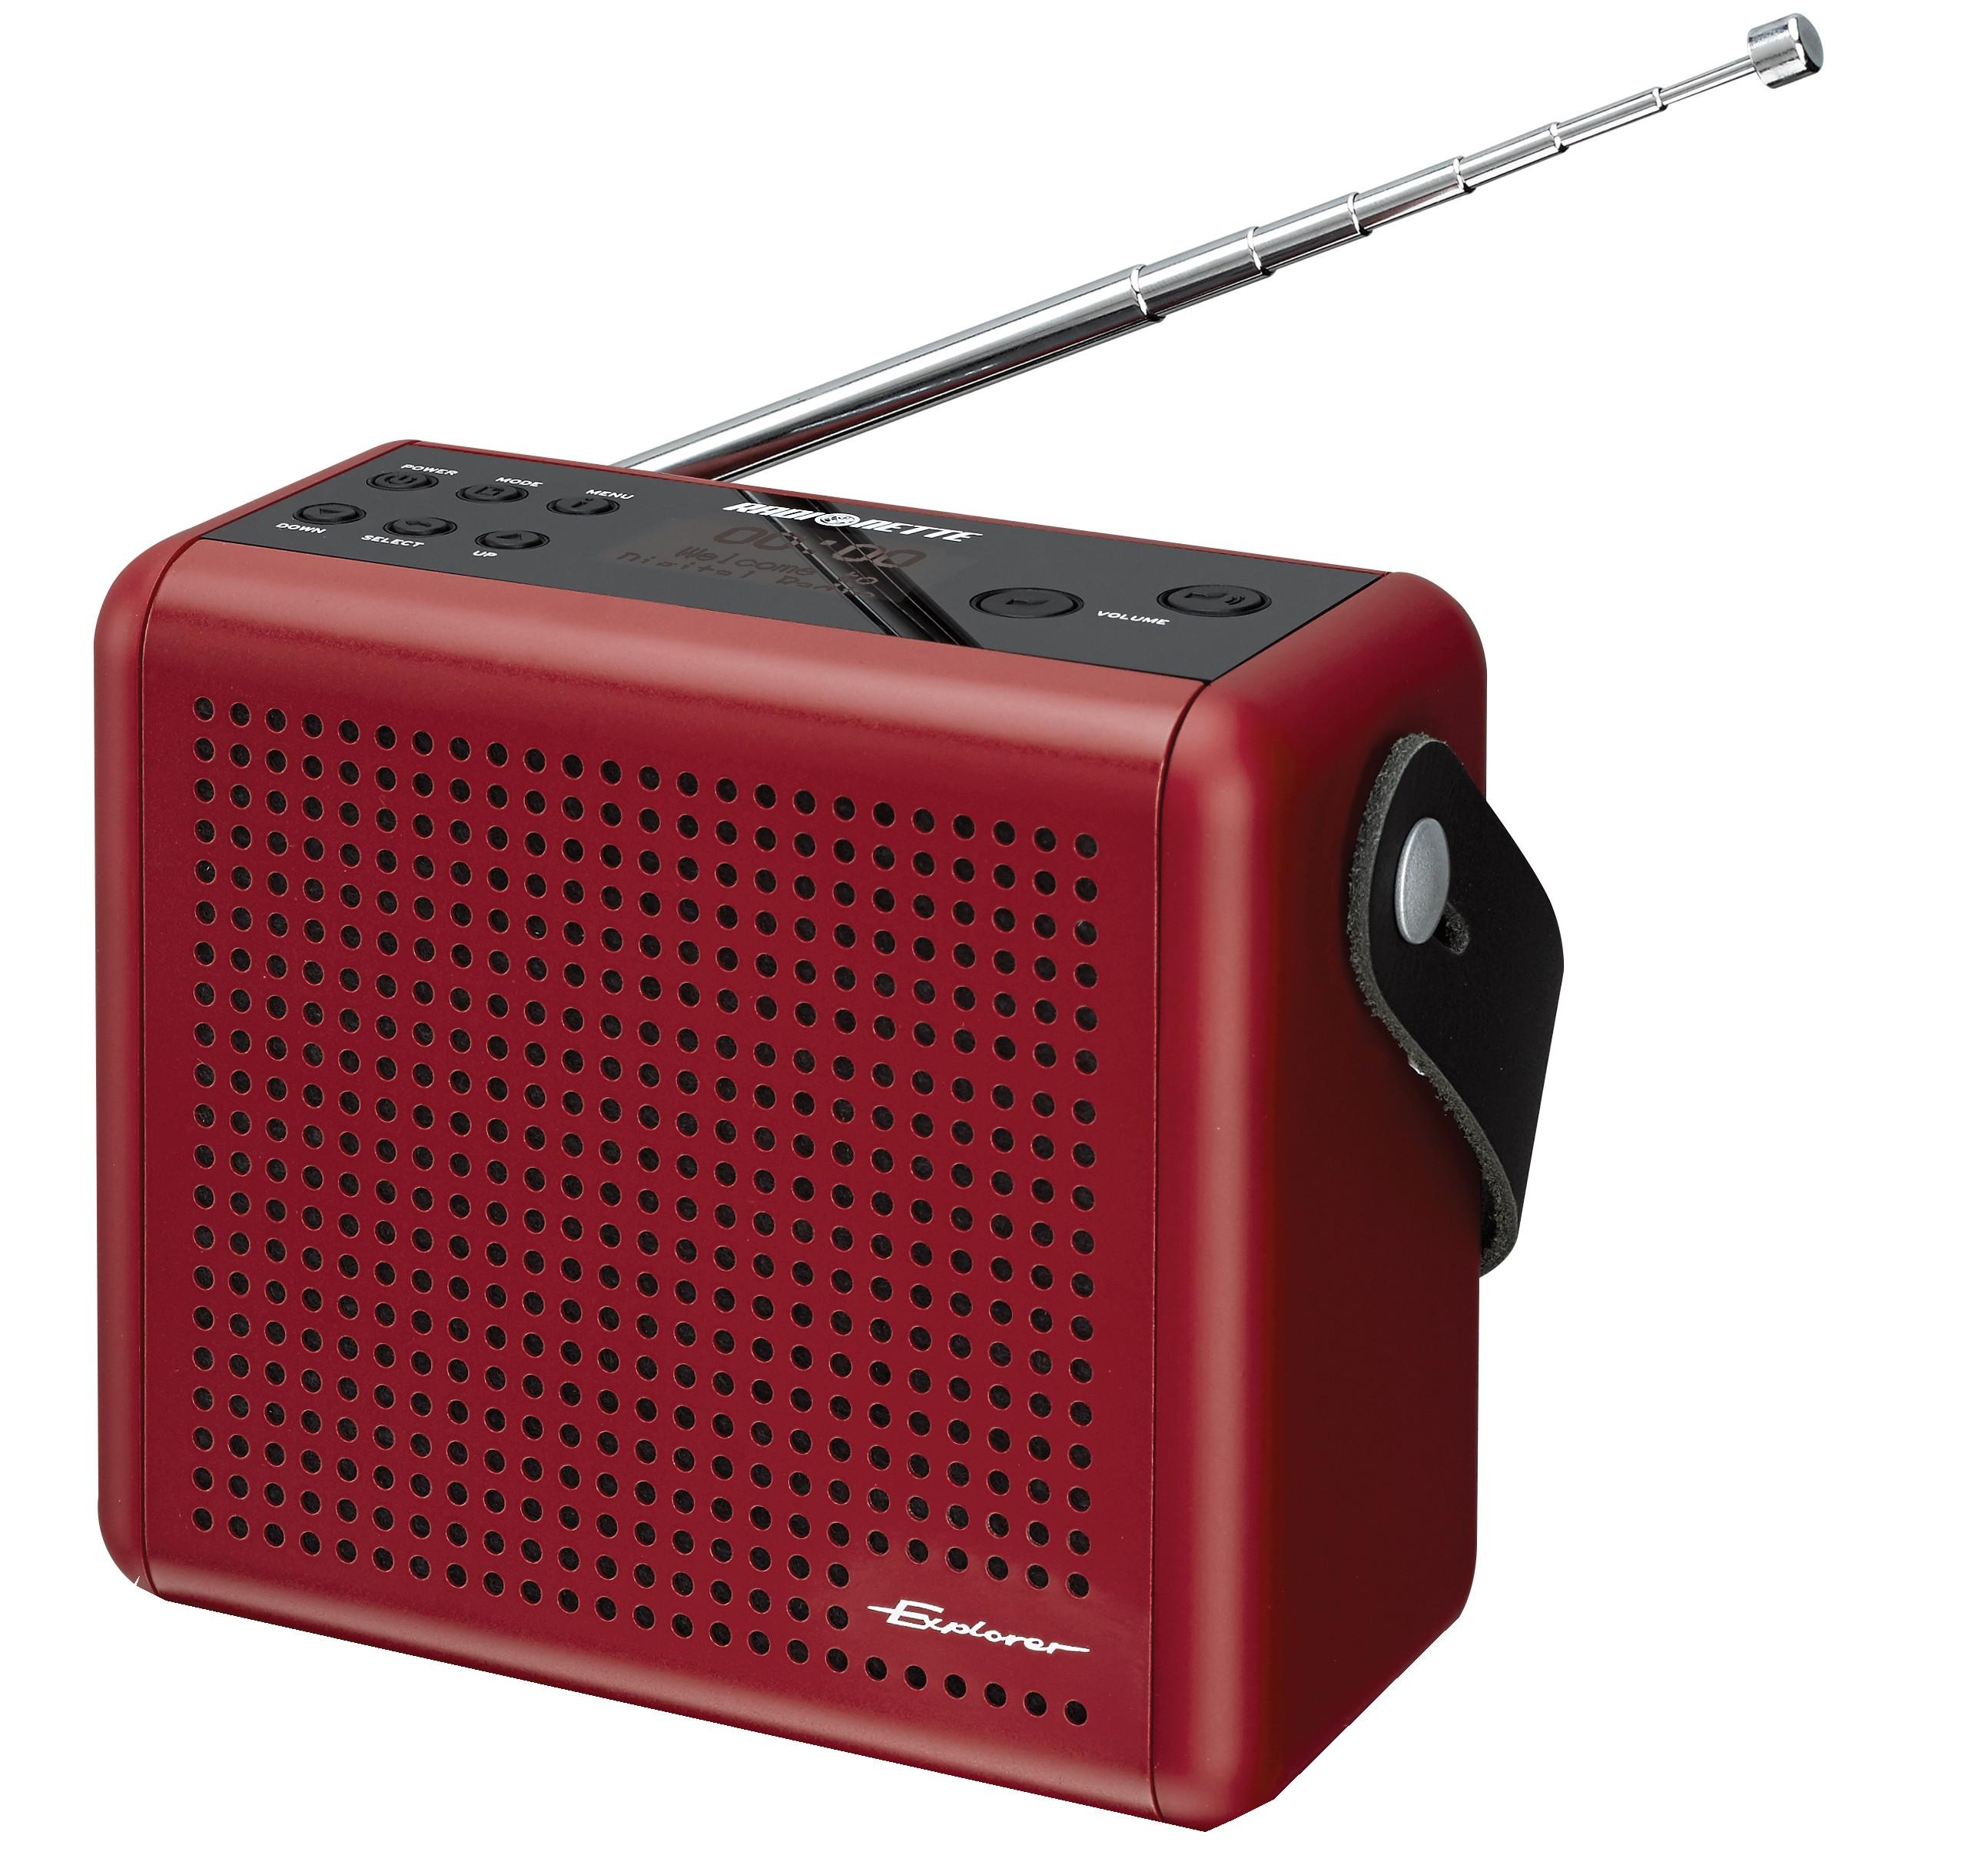 test fm dab radio dab - Prissøk - Gir deg laveste pris 89faaceb36613